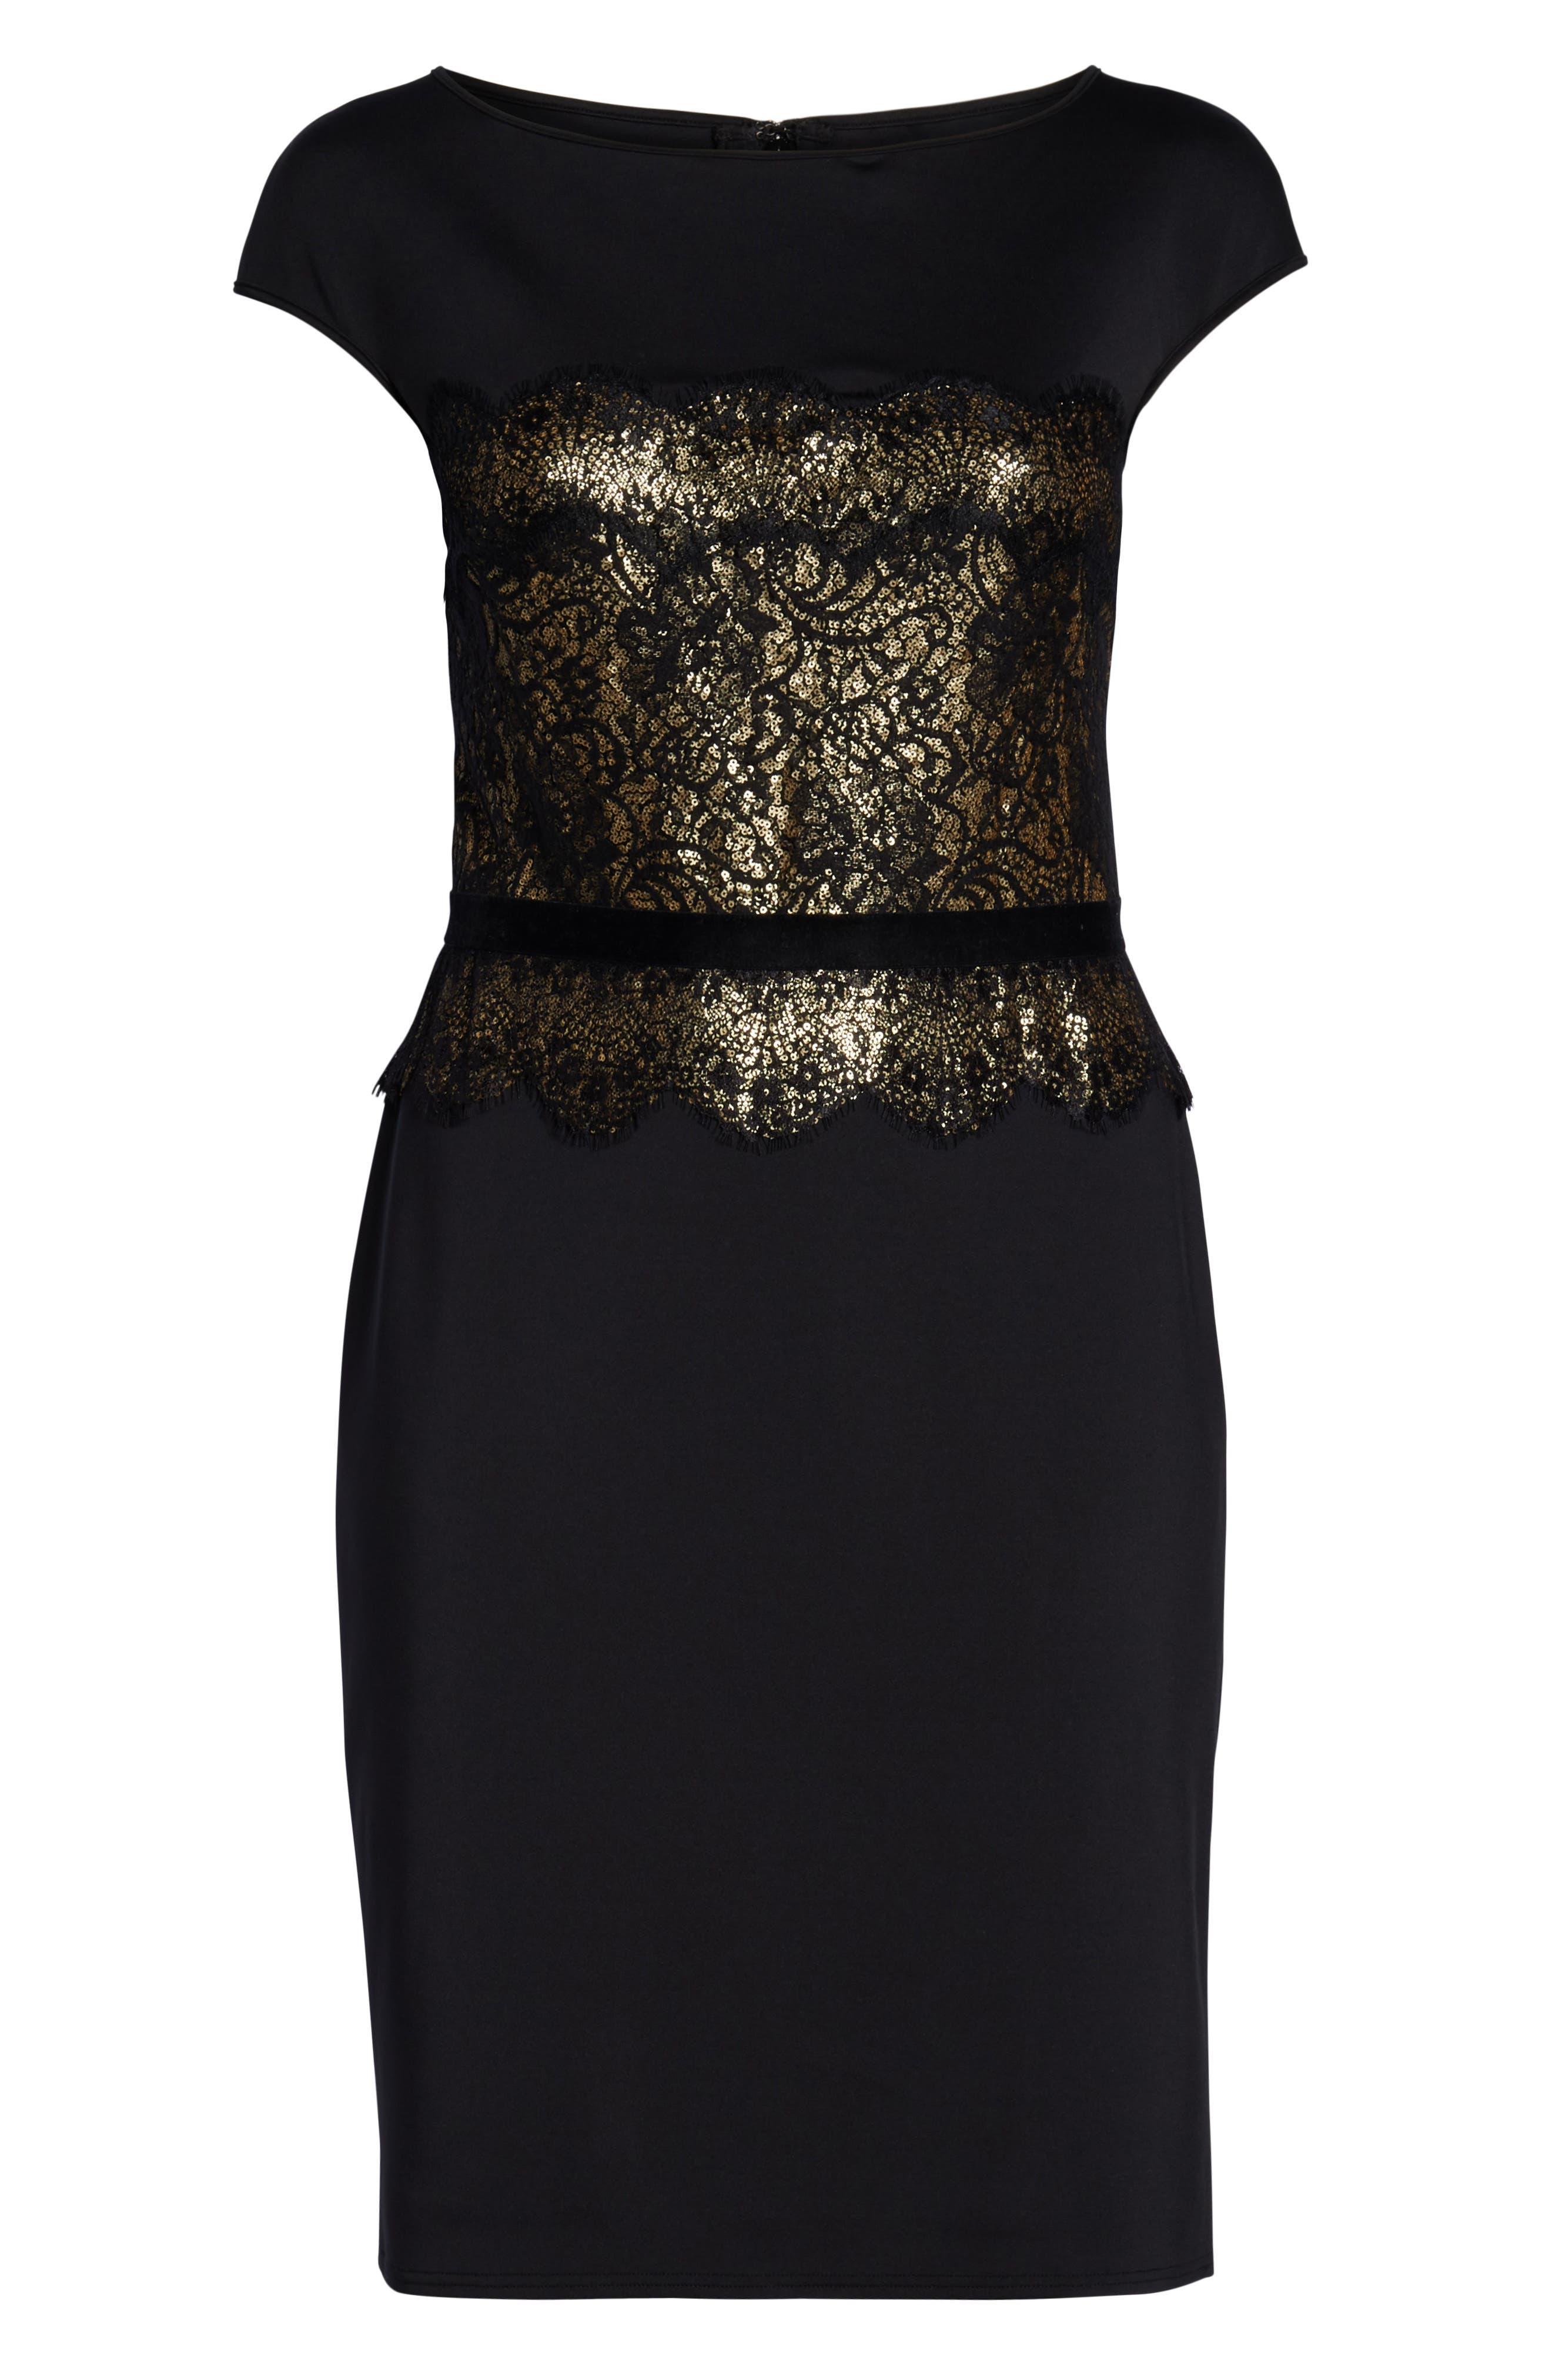 Lace Inset Scuba Dress,                             Alternate thumbnail 13, color,                             BLACK/ GOLD